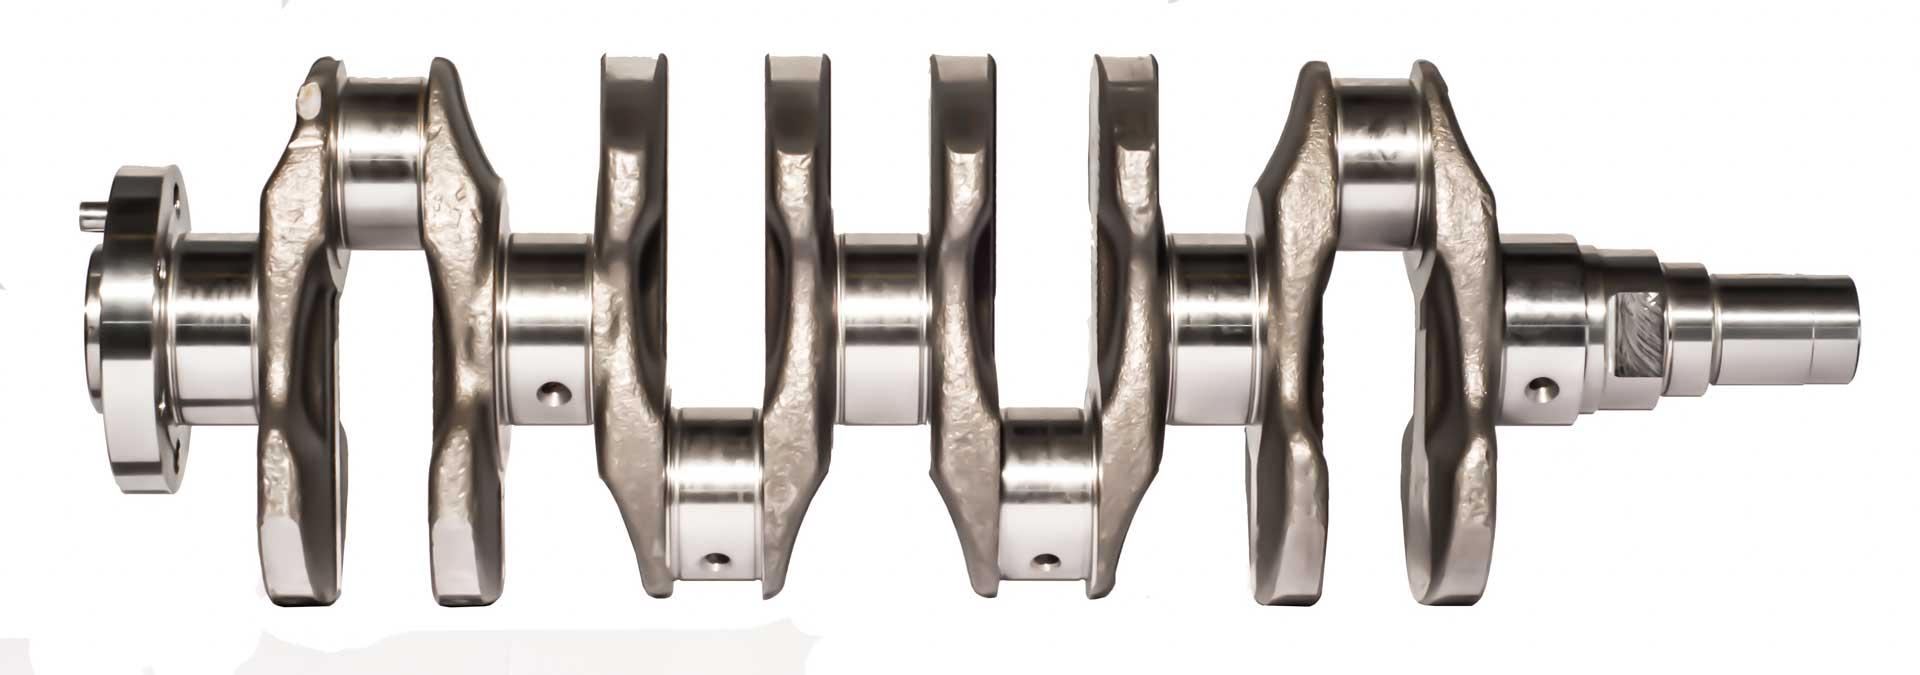 Millangsazan – Crankshaft manufacturer